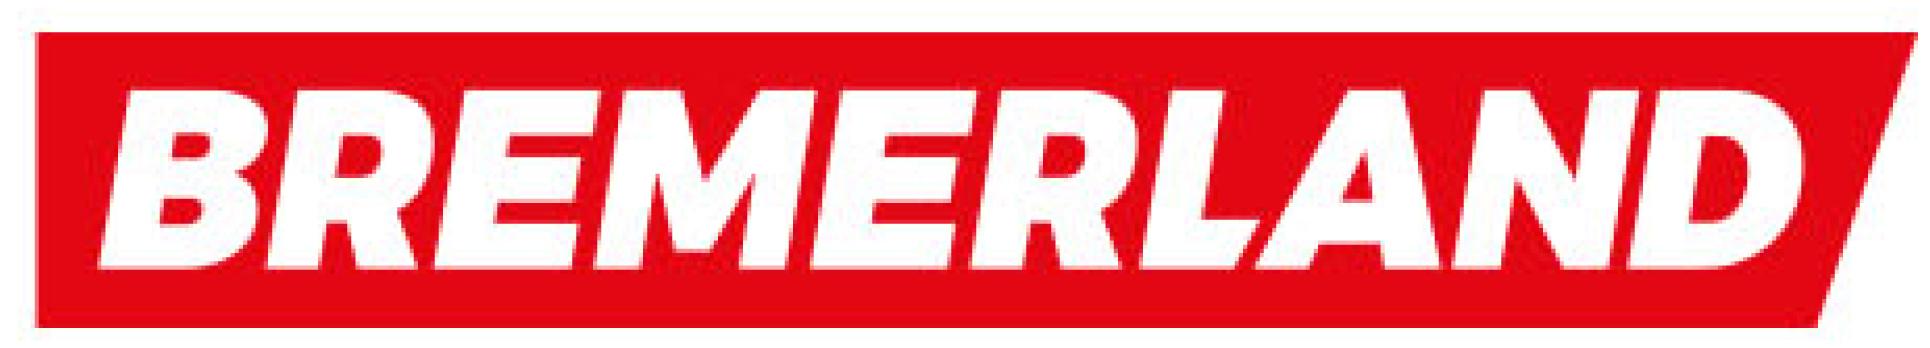 bremerland logo milch